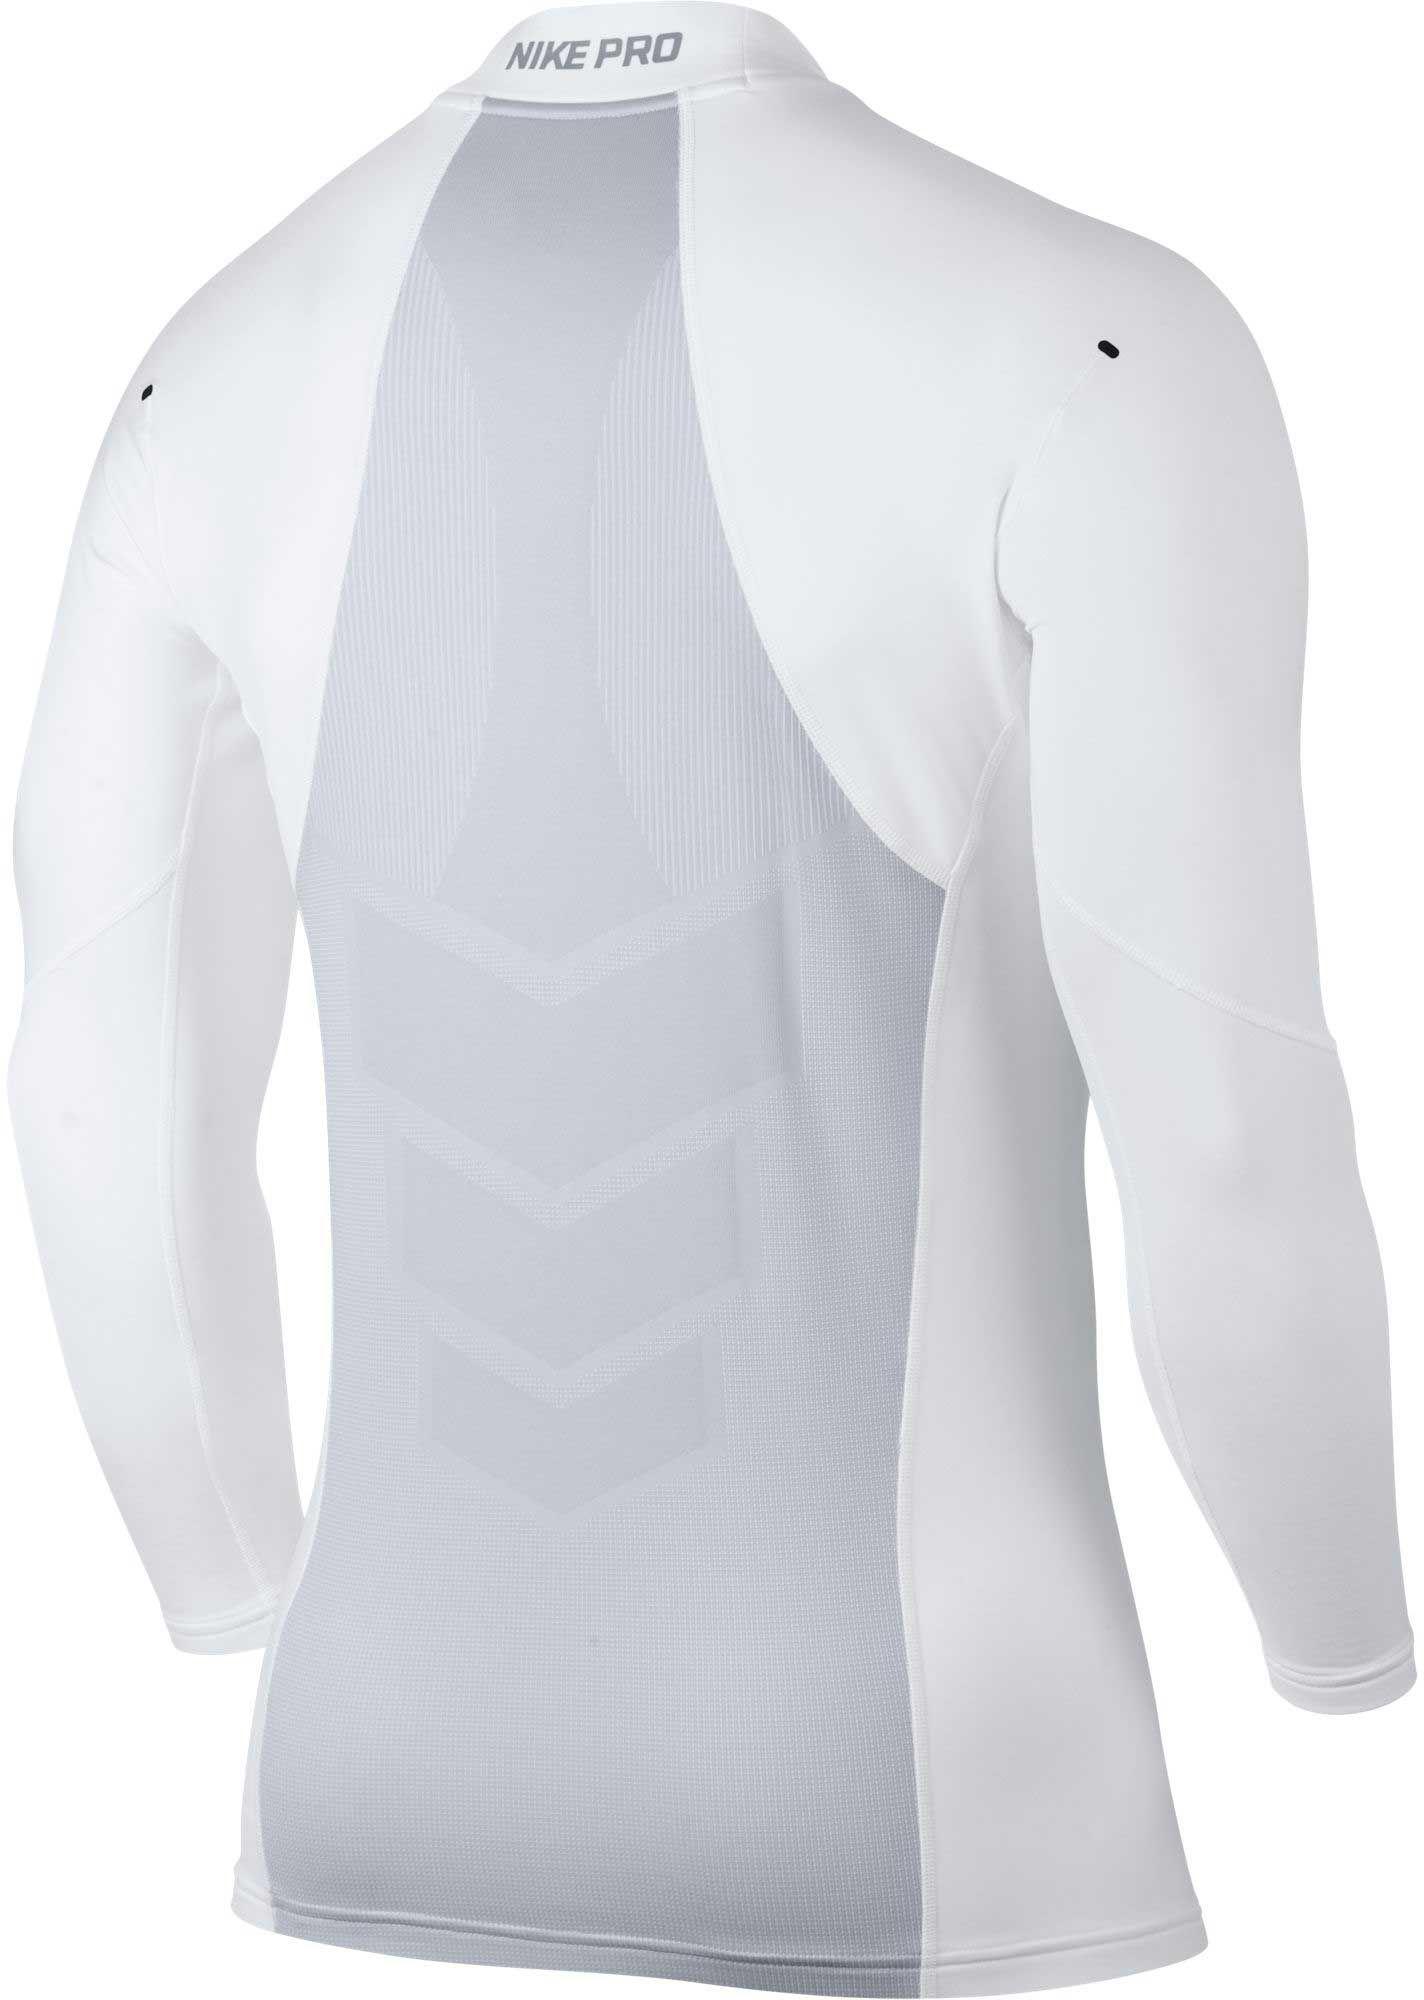 9bdfbb1bf5a37 Nike Pro Hyperwarm Aeroloft Mens Long Sleeve Training Top Black